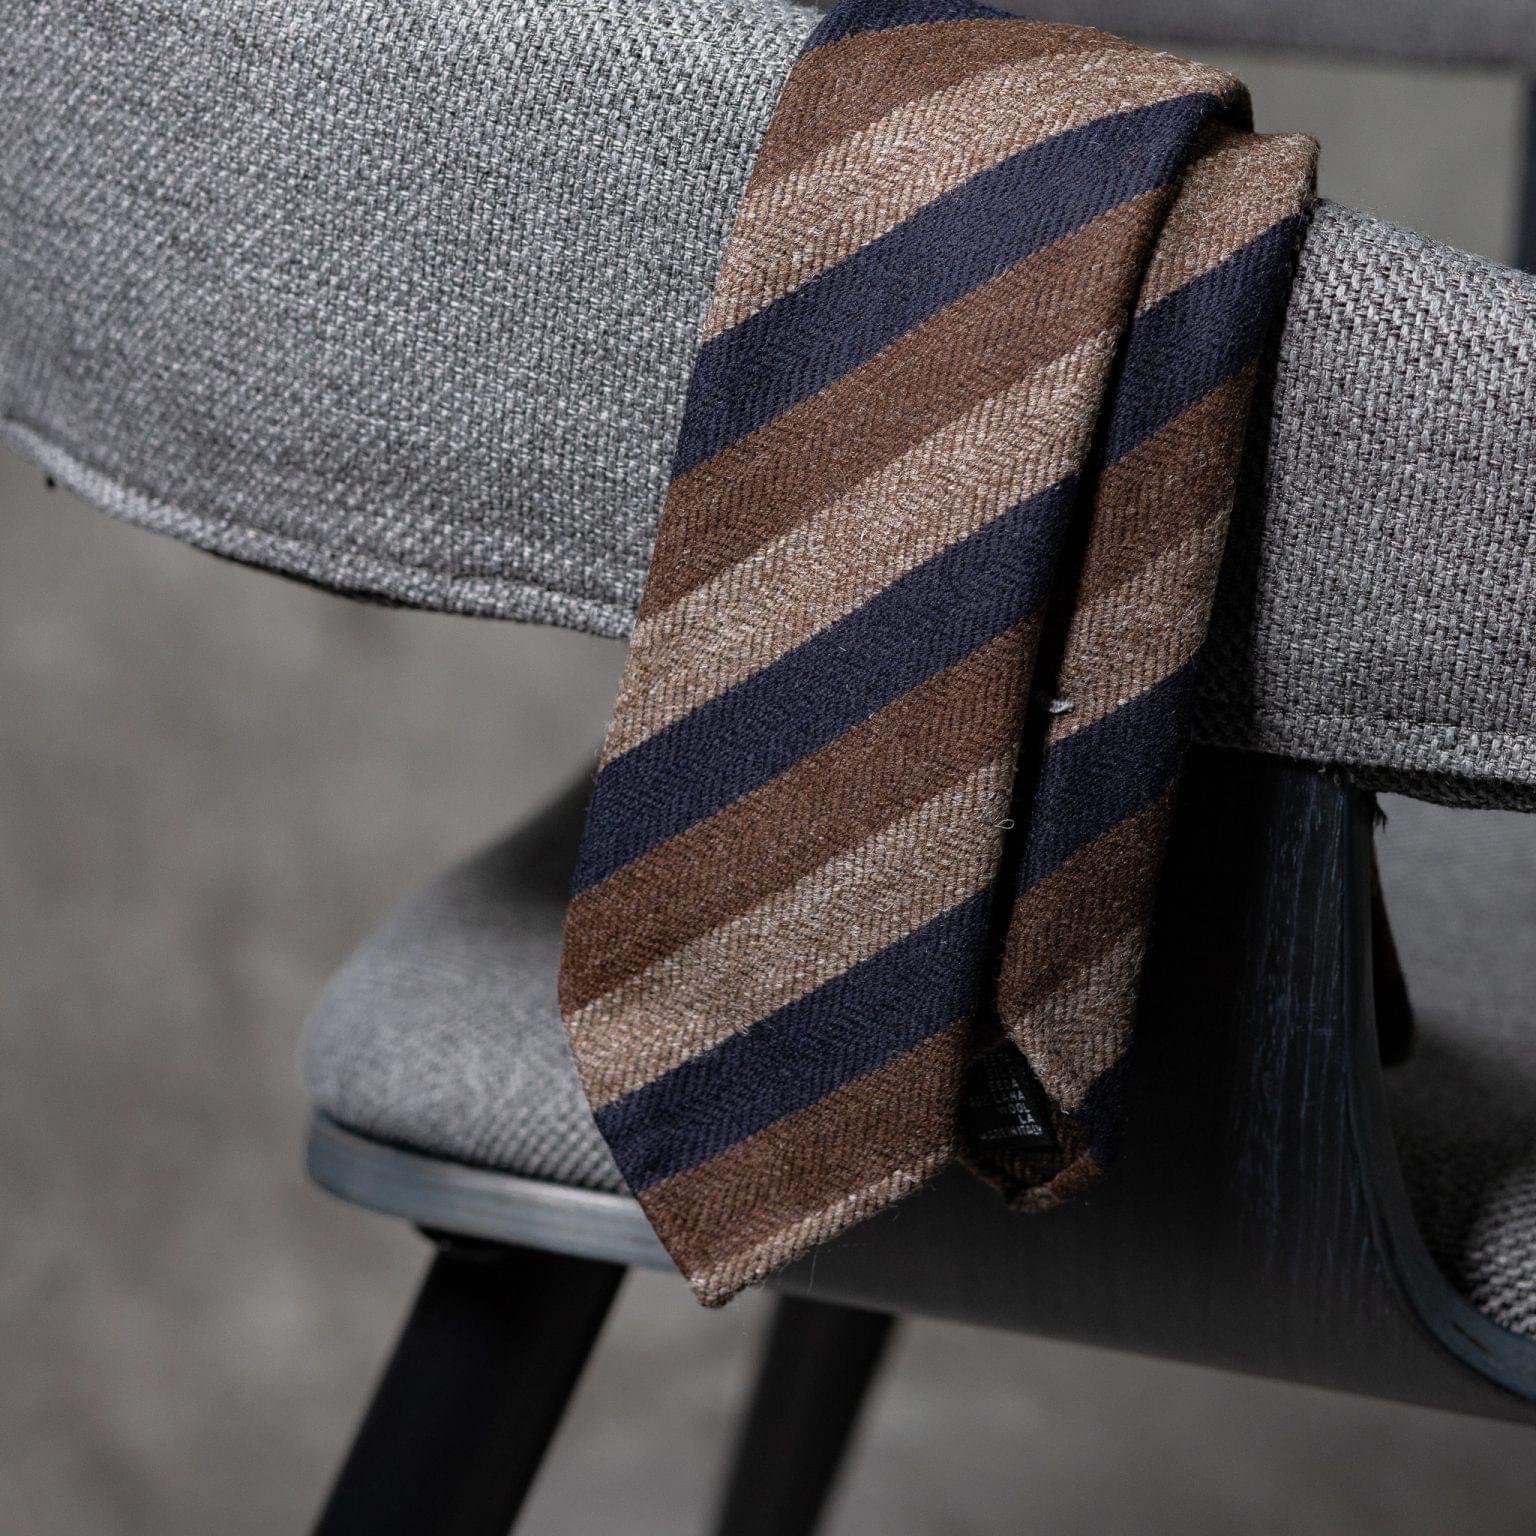 WOOL-LANA-0515-Tie-Initials-Corbata-Iniciales-The-Seelk-2